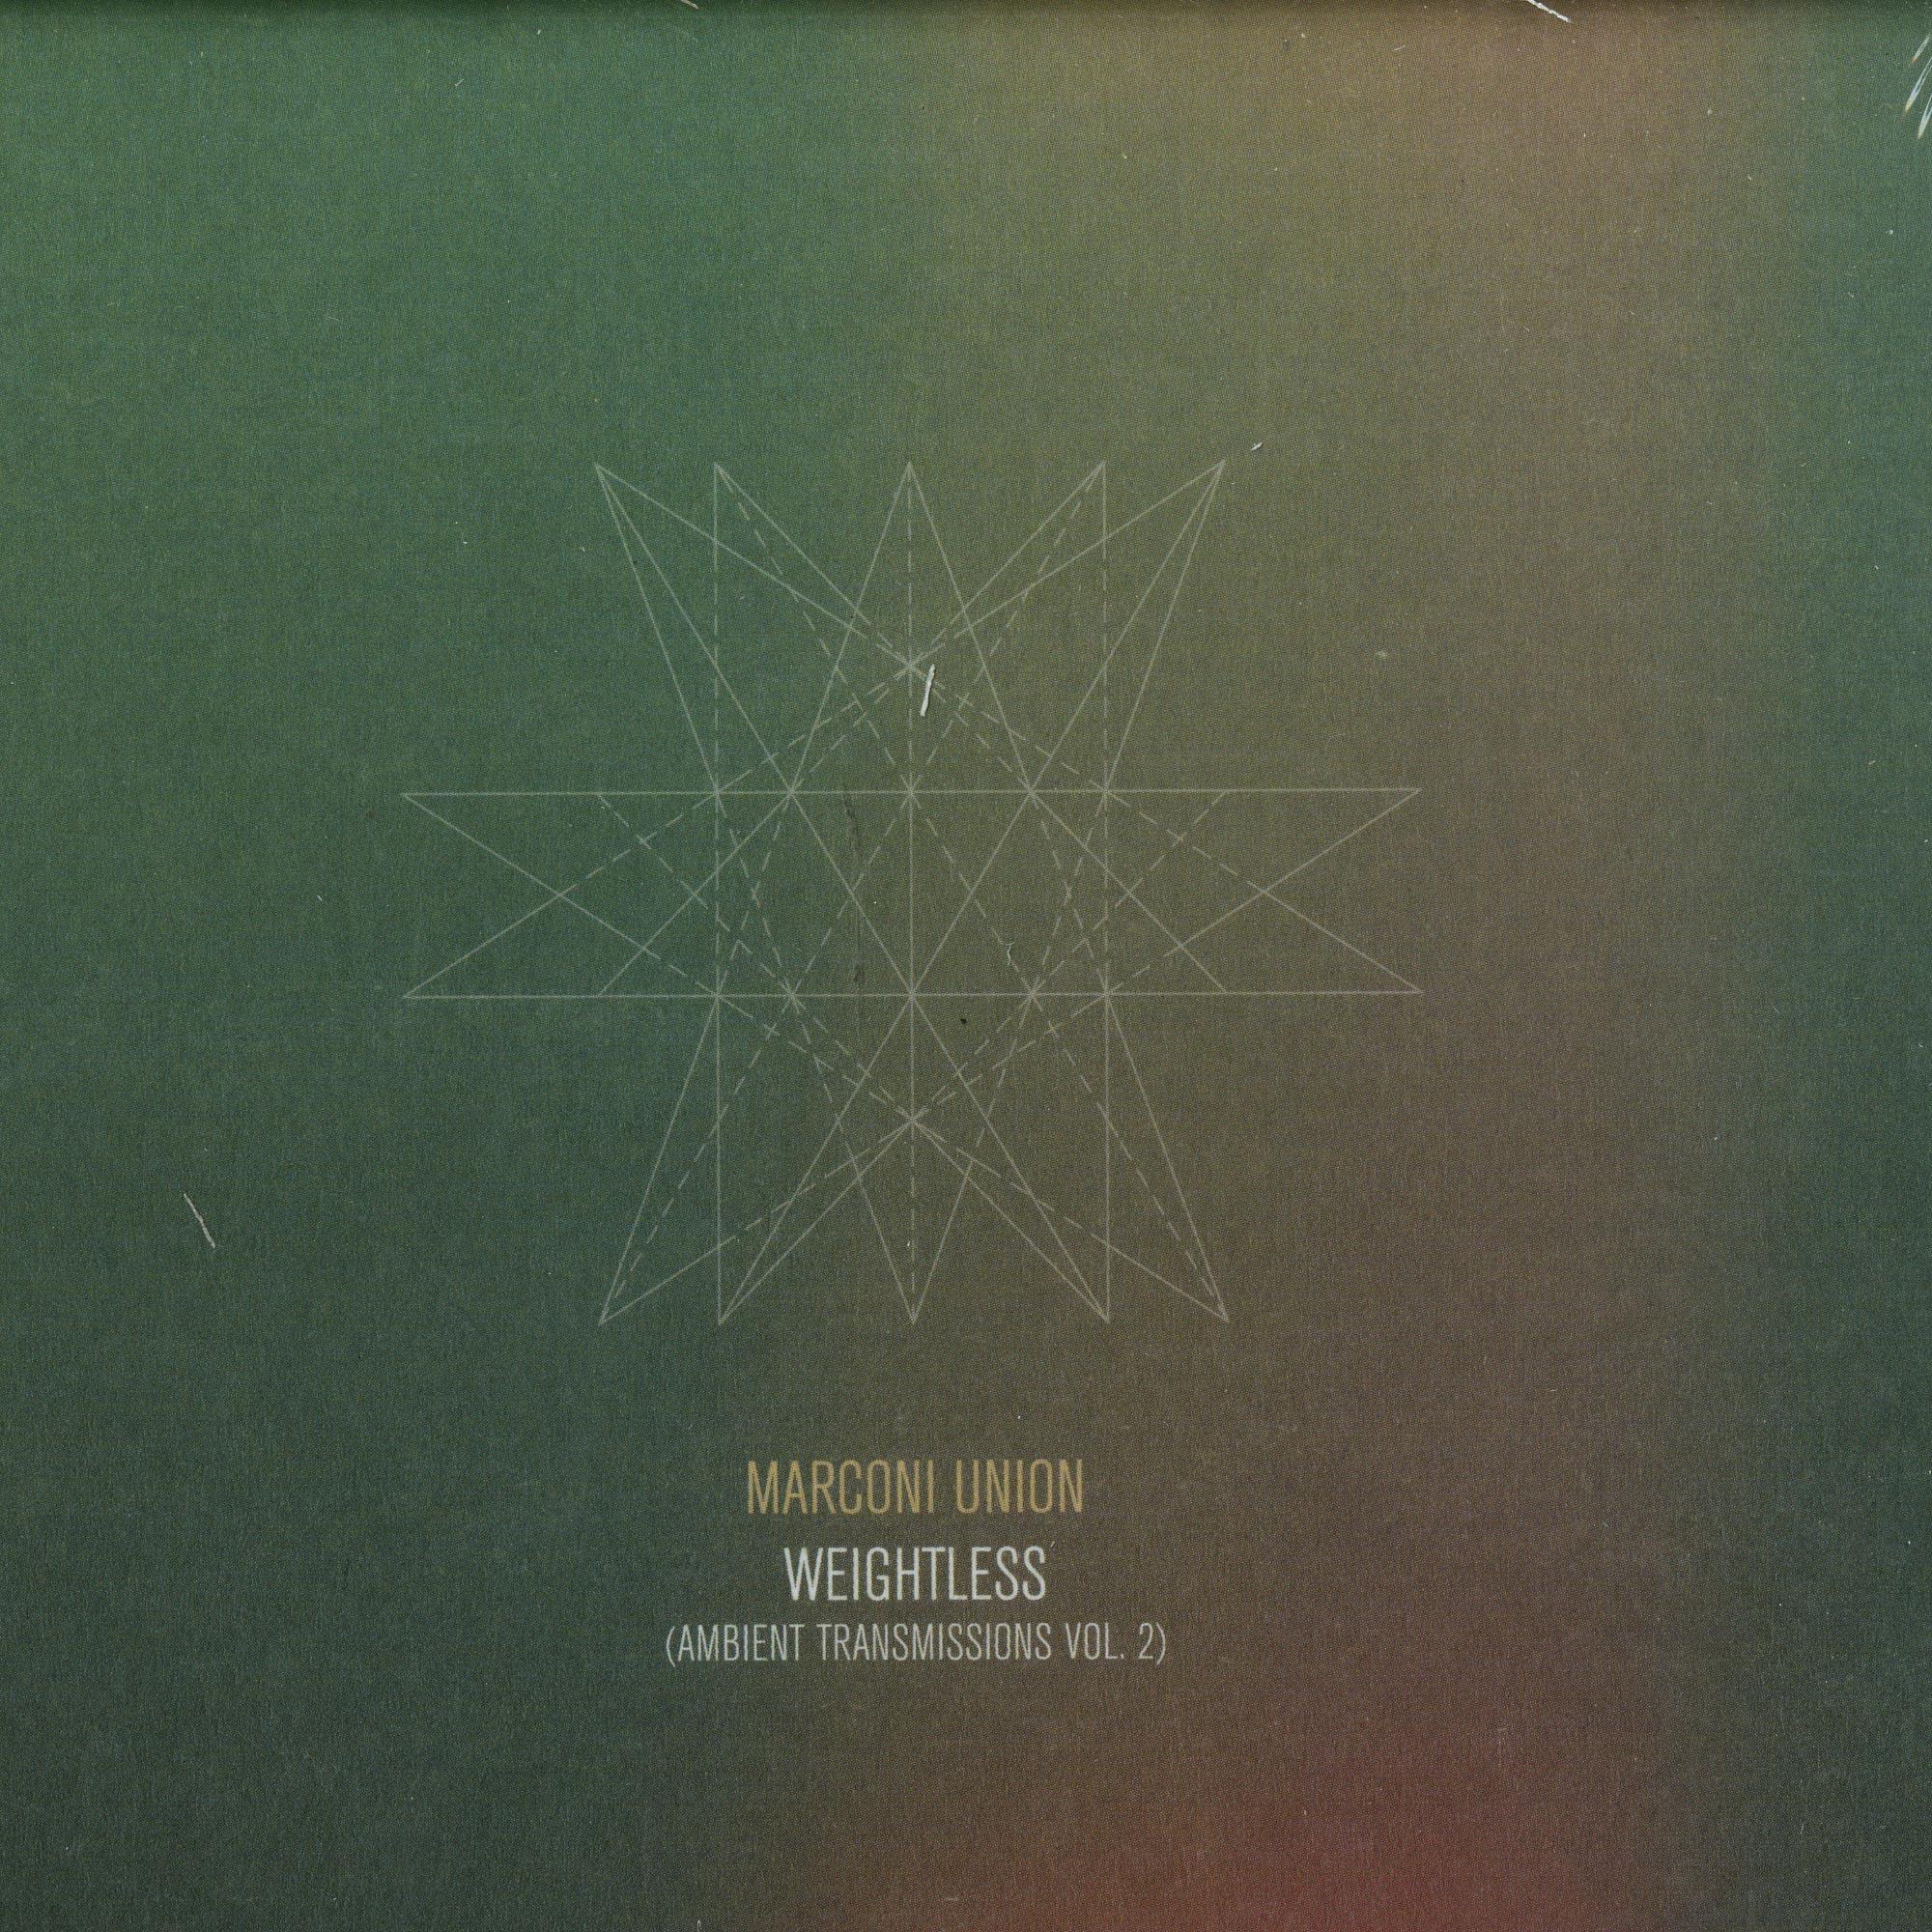 Marconi Union - WEIGHTLESS